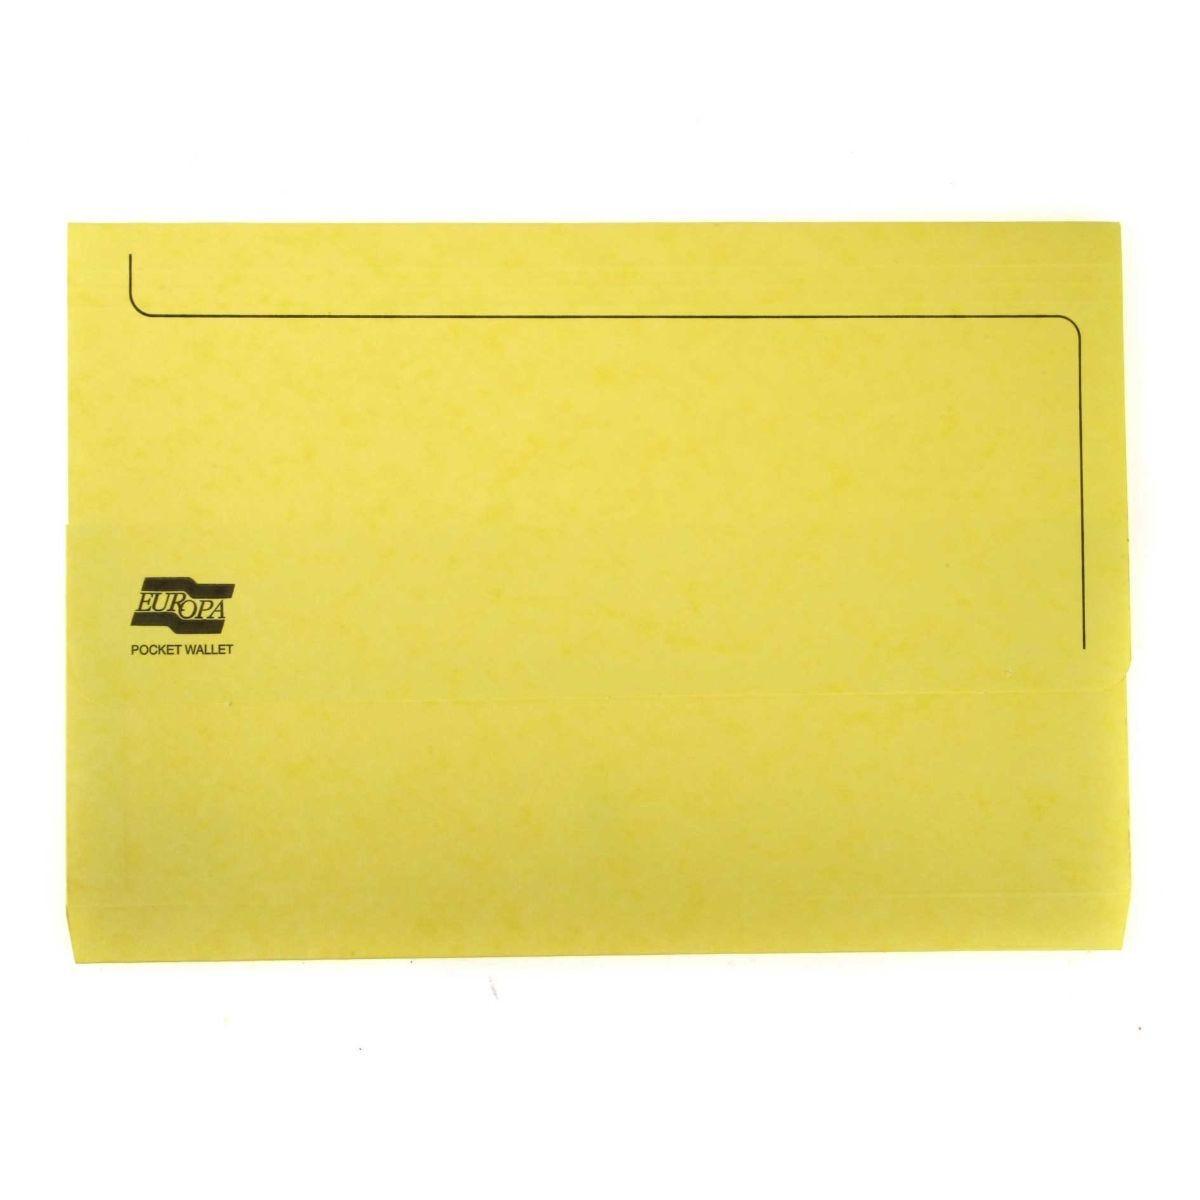 Europa Pocket Wallets Foolscap Pack of 25 Lemon